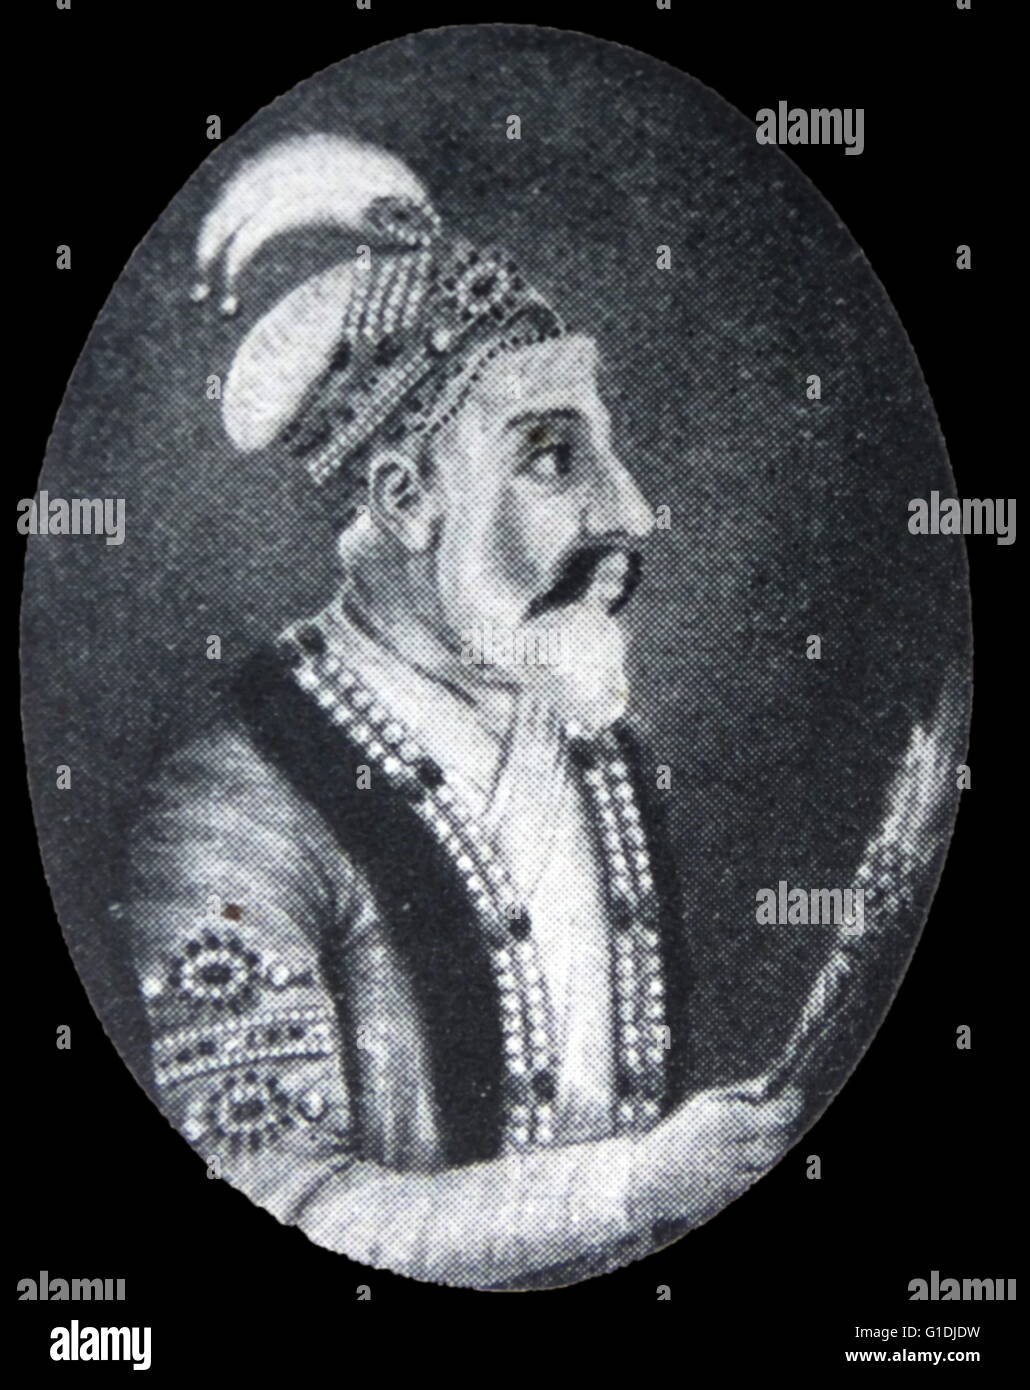 Shah Jahan 1592-1666. Mughal Emperor of India 1628-1658. Stock Photo